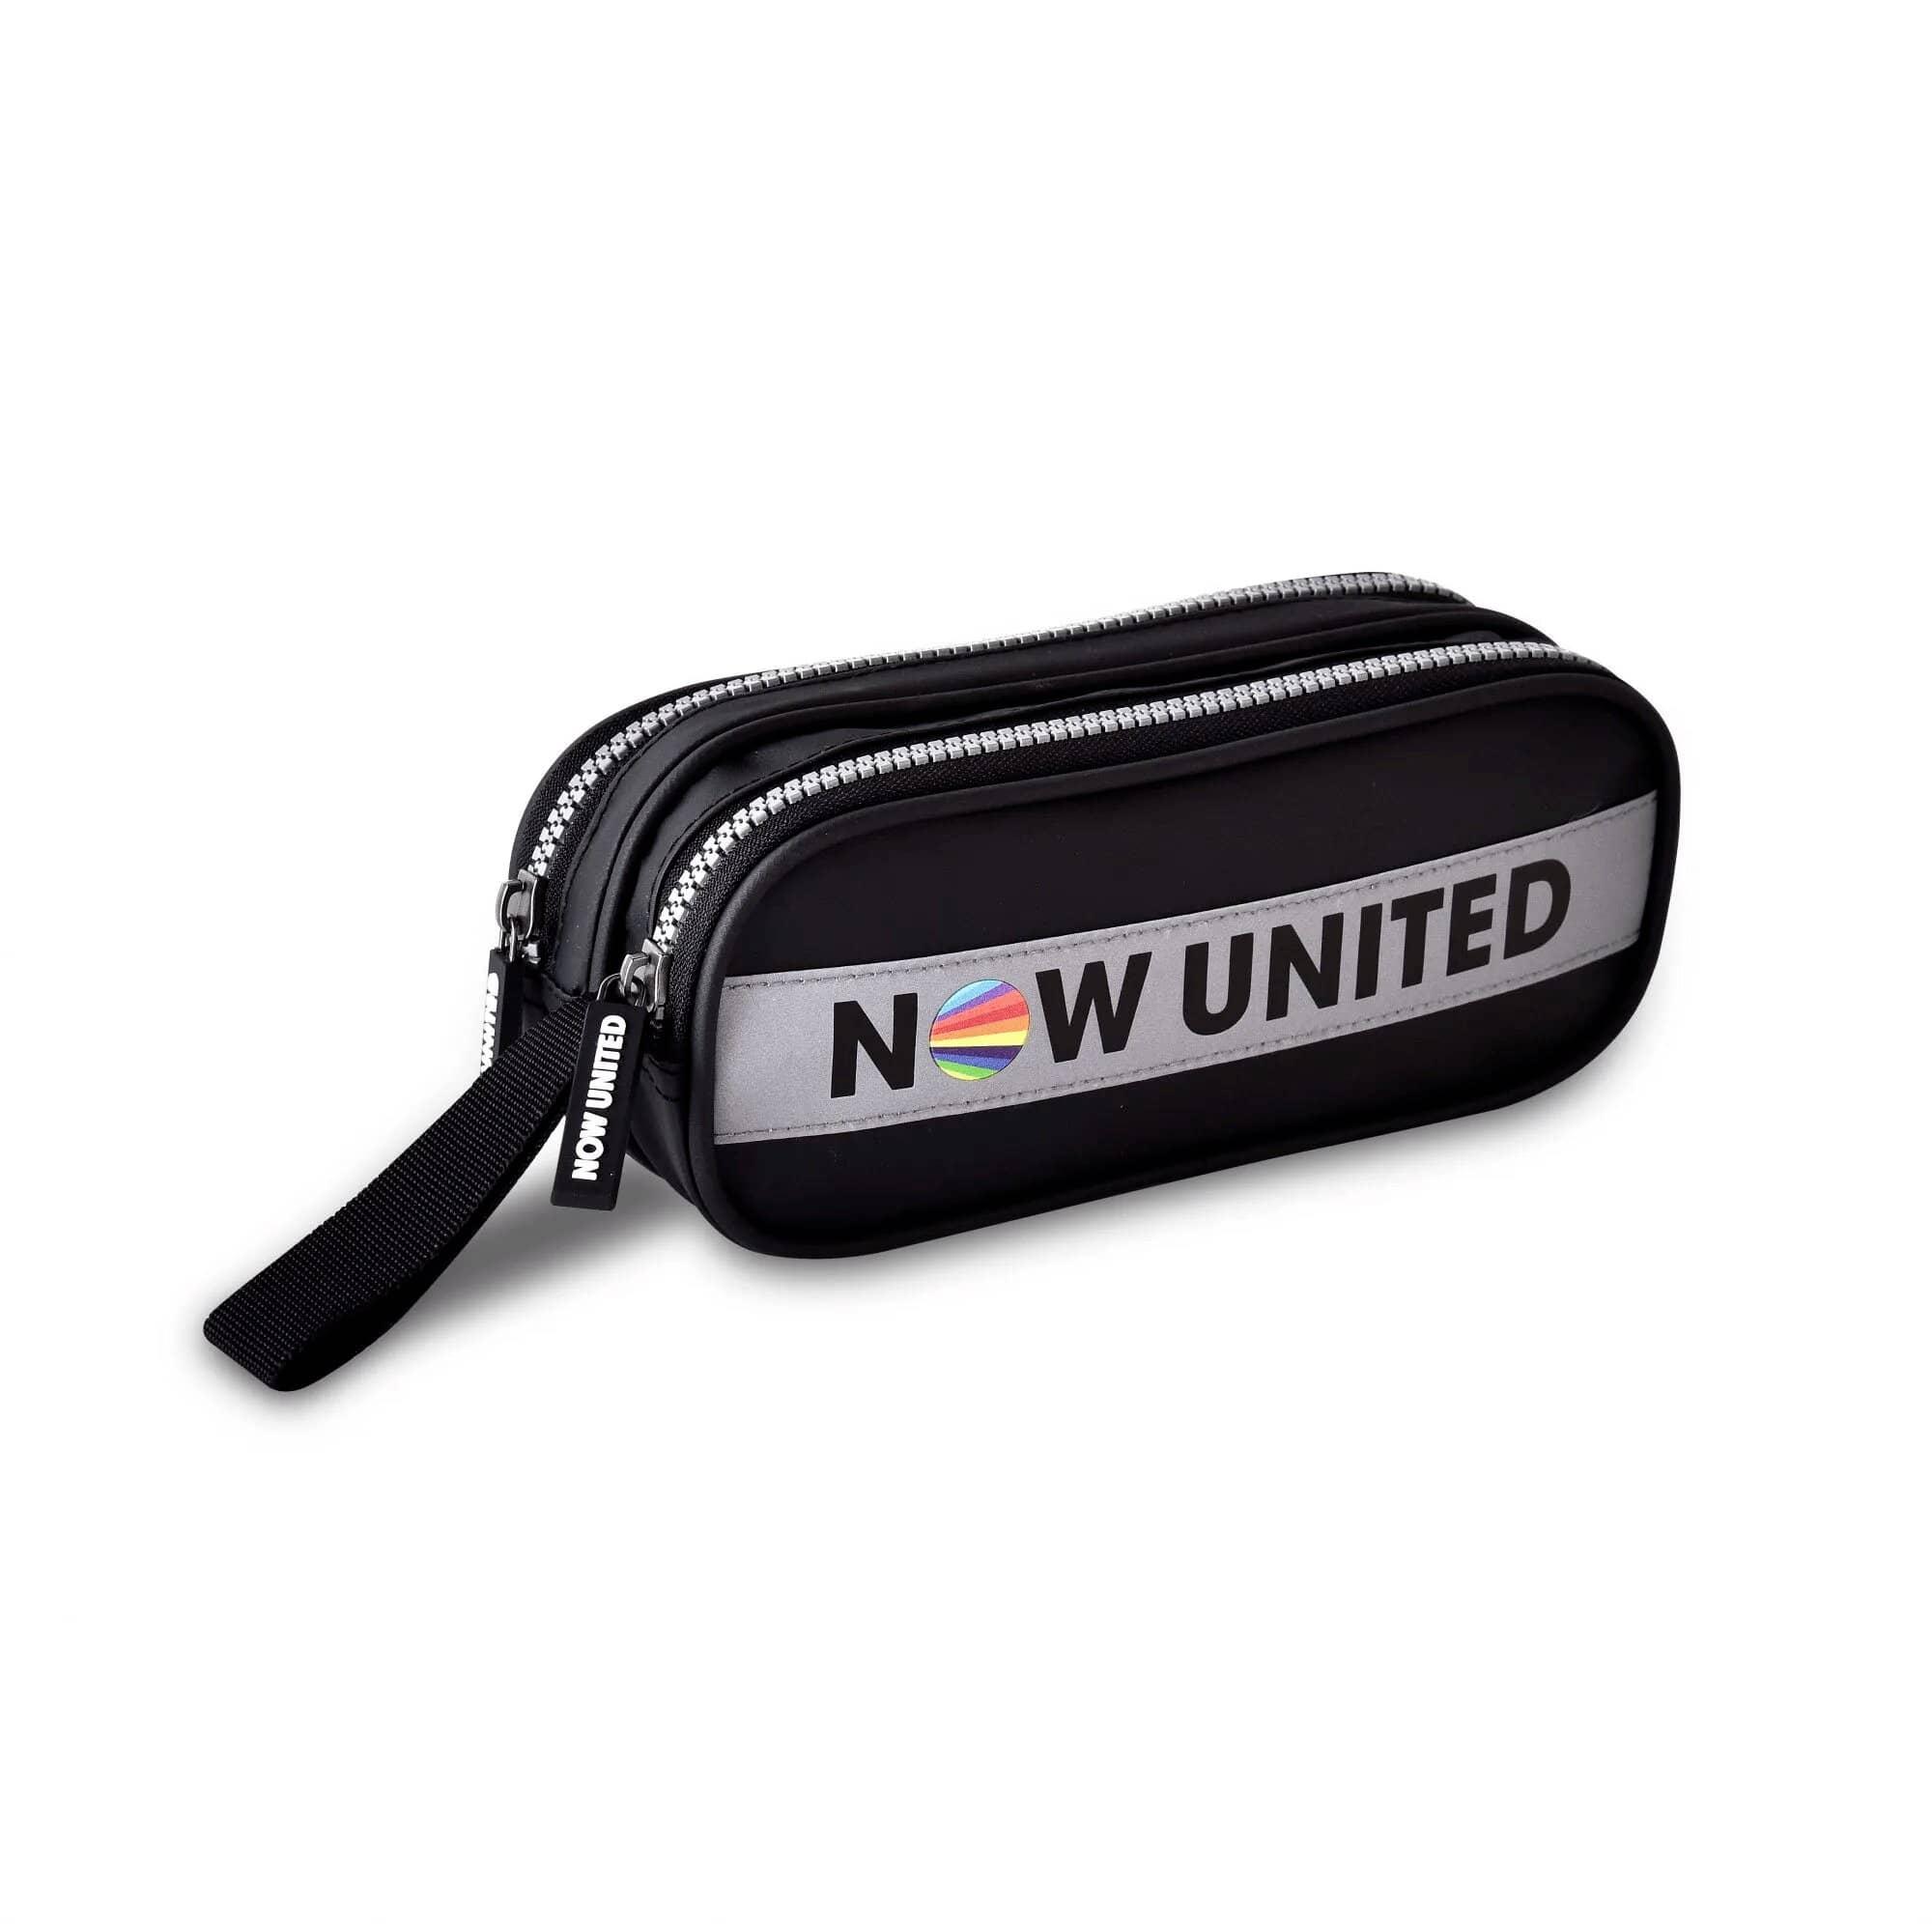 Estojo Duplo Oficial - Now United